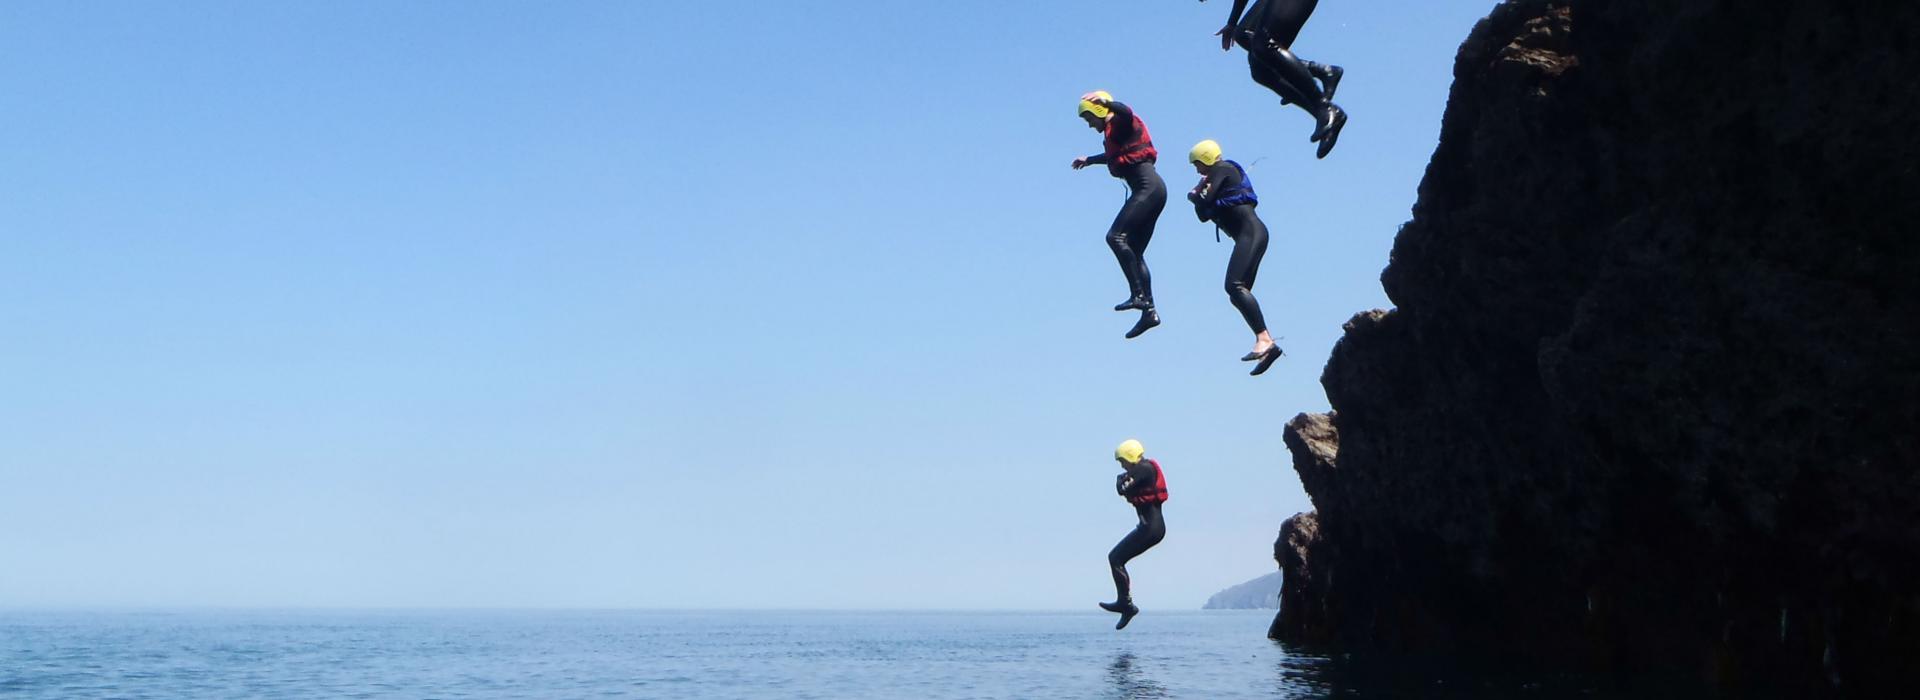 coasteering devon, coasteering north devon, things to do near me, watersports devon, activities, adrenaline activities near me